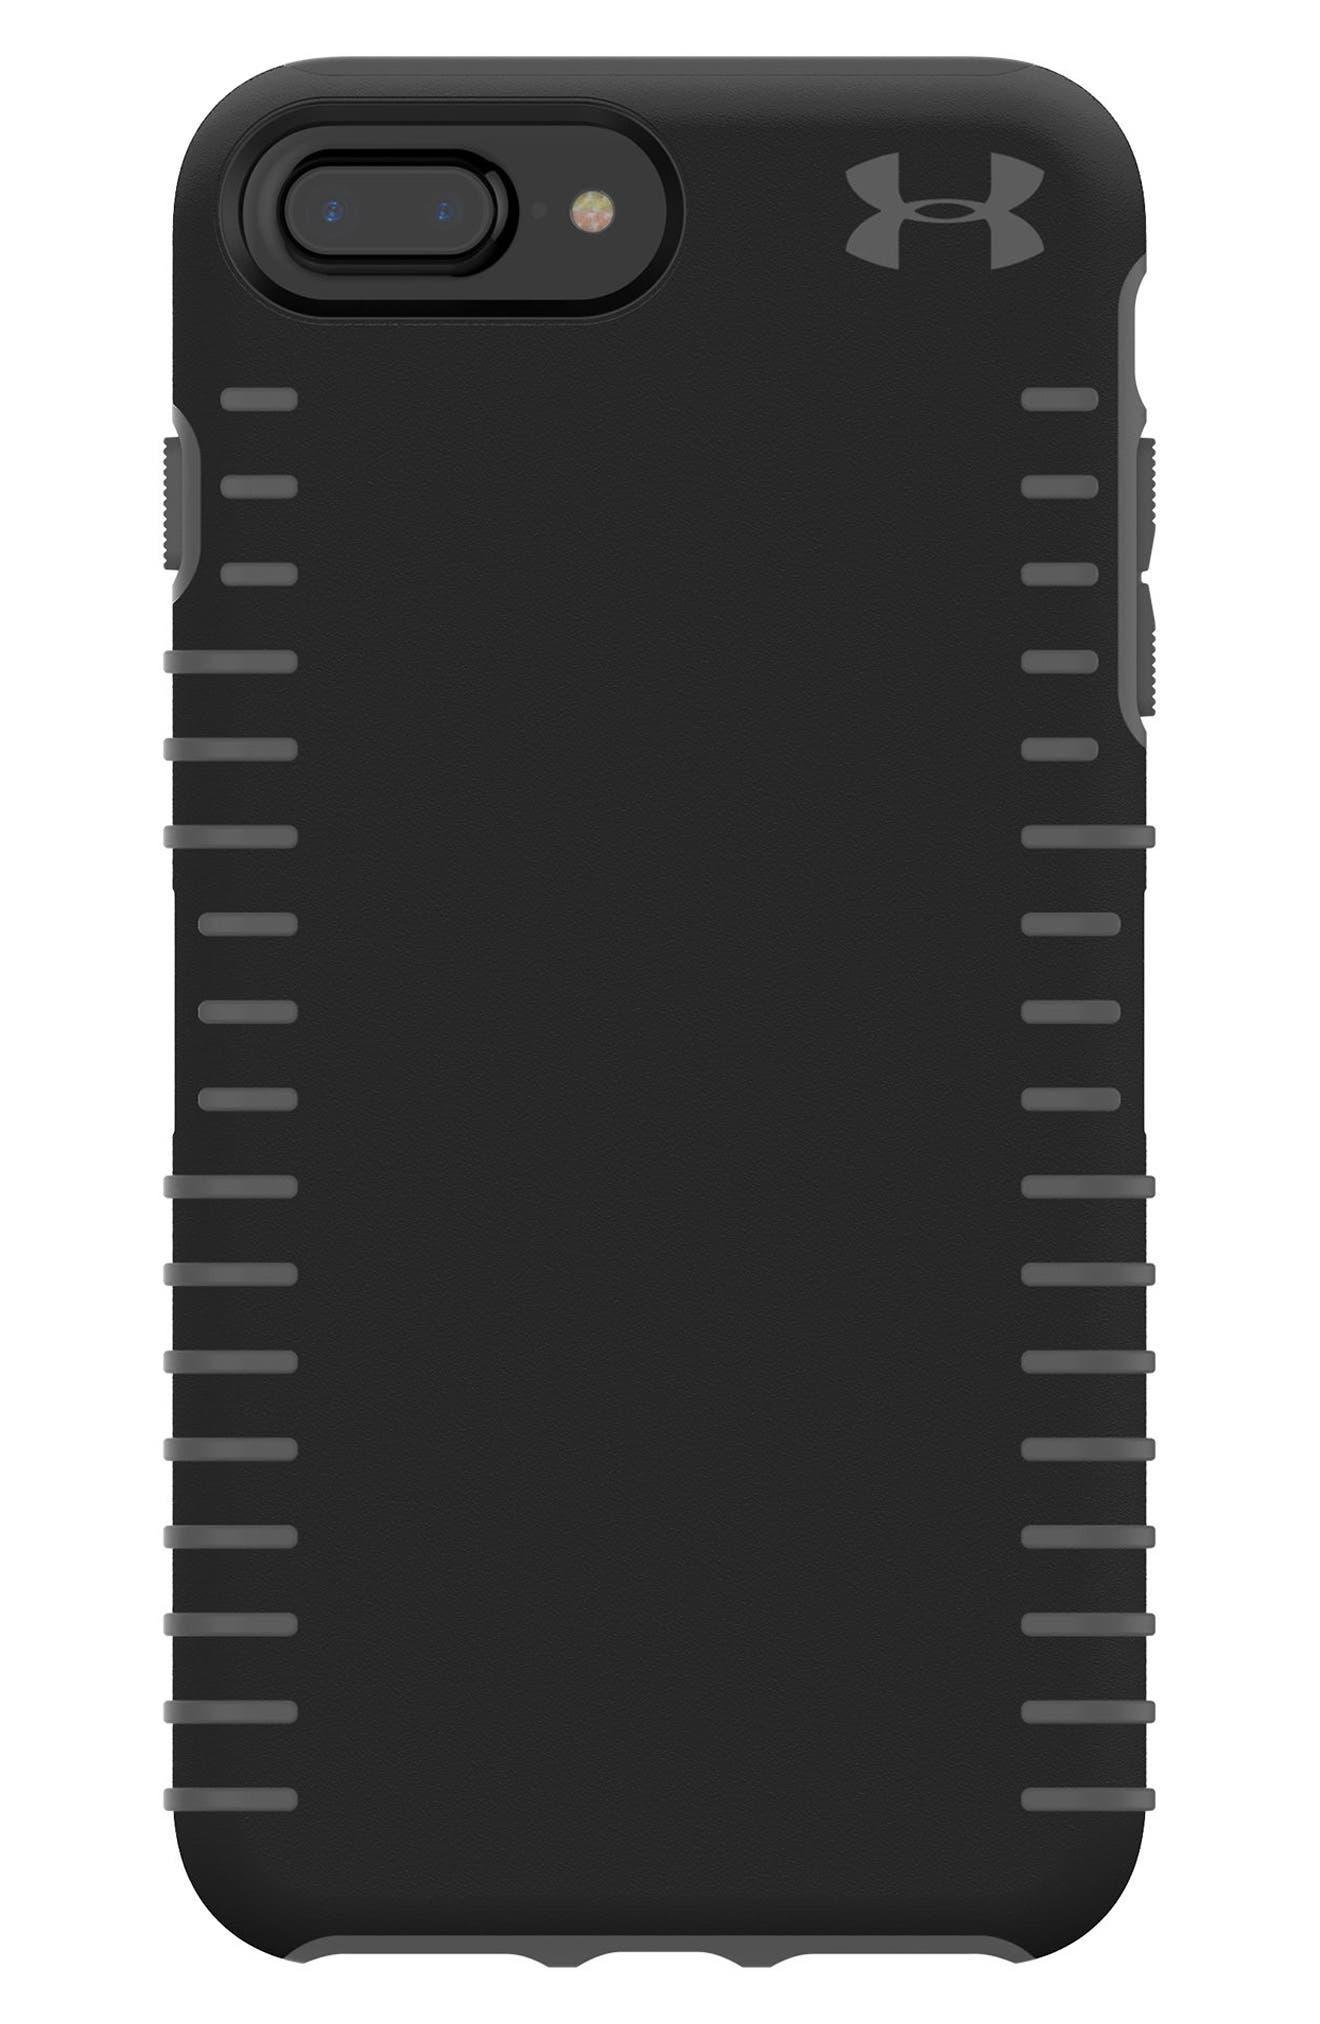 Main Image - Under Armour Protect Grip iPhone 6/6s/7/8 Plus Case